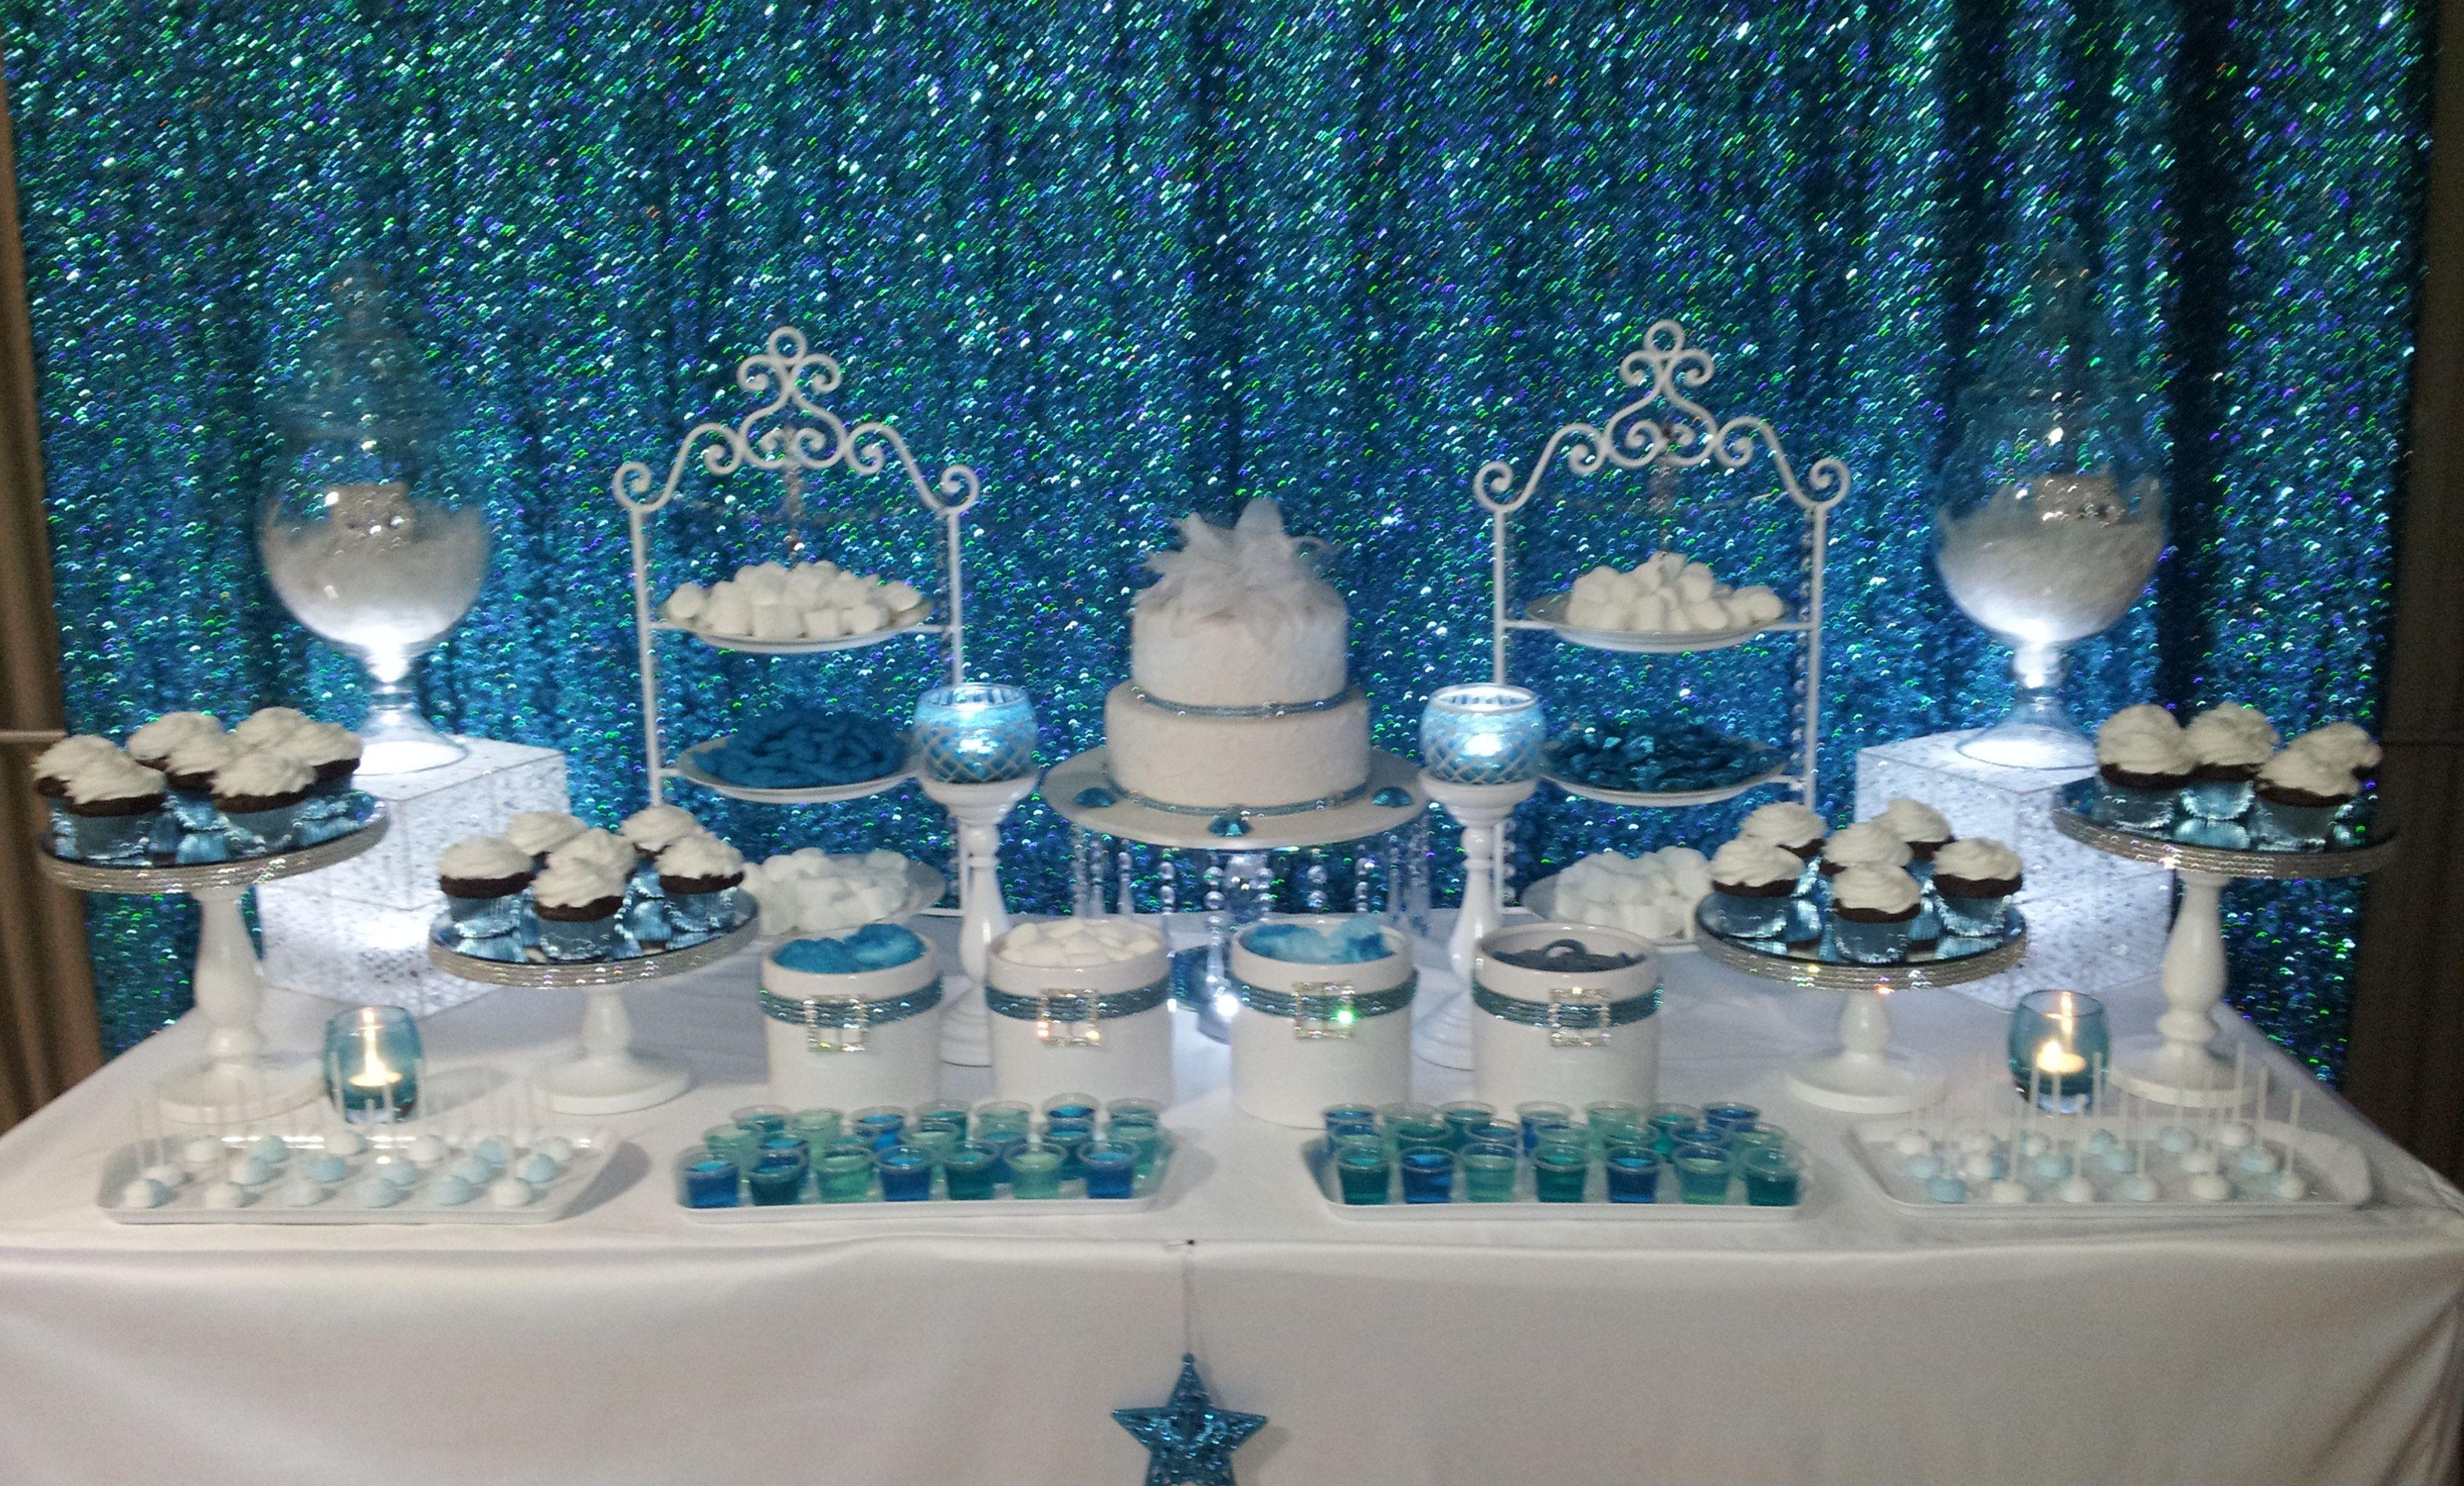 Winter Wonderland Candy Buffet Sweet 16th Birthday Wonderland Party Decorations Frozen Party Decorations Wonderland Wedding Cake